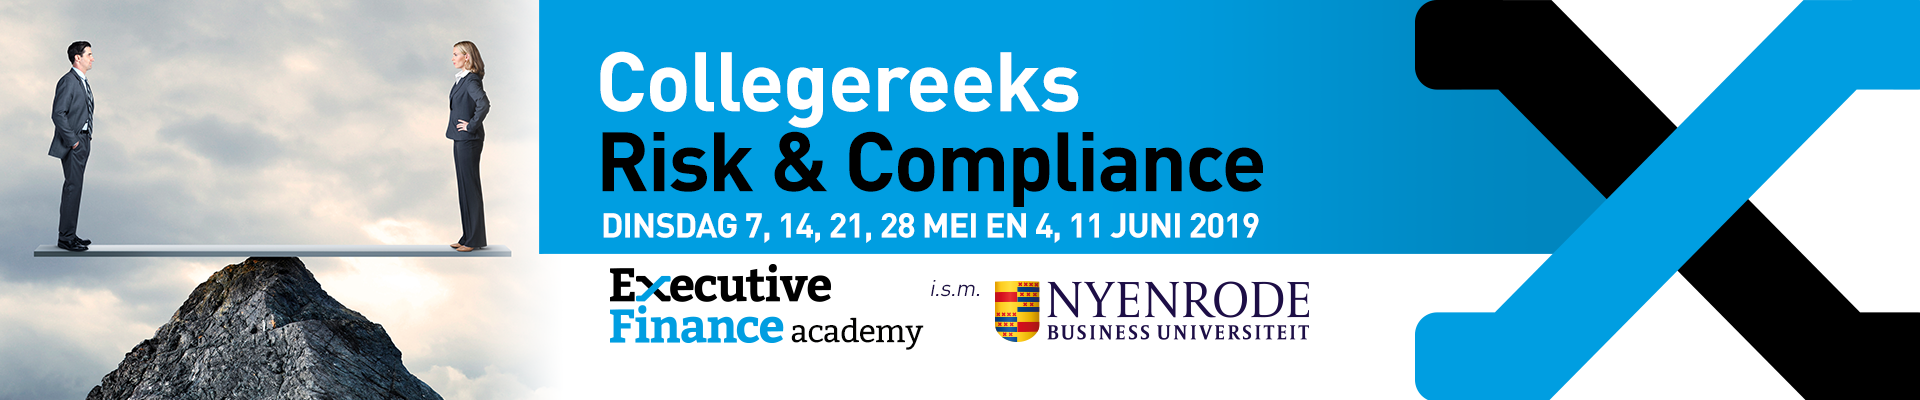 Collegereeks Risk & Compliance